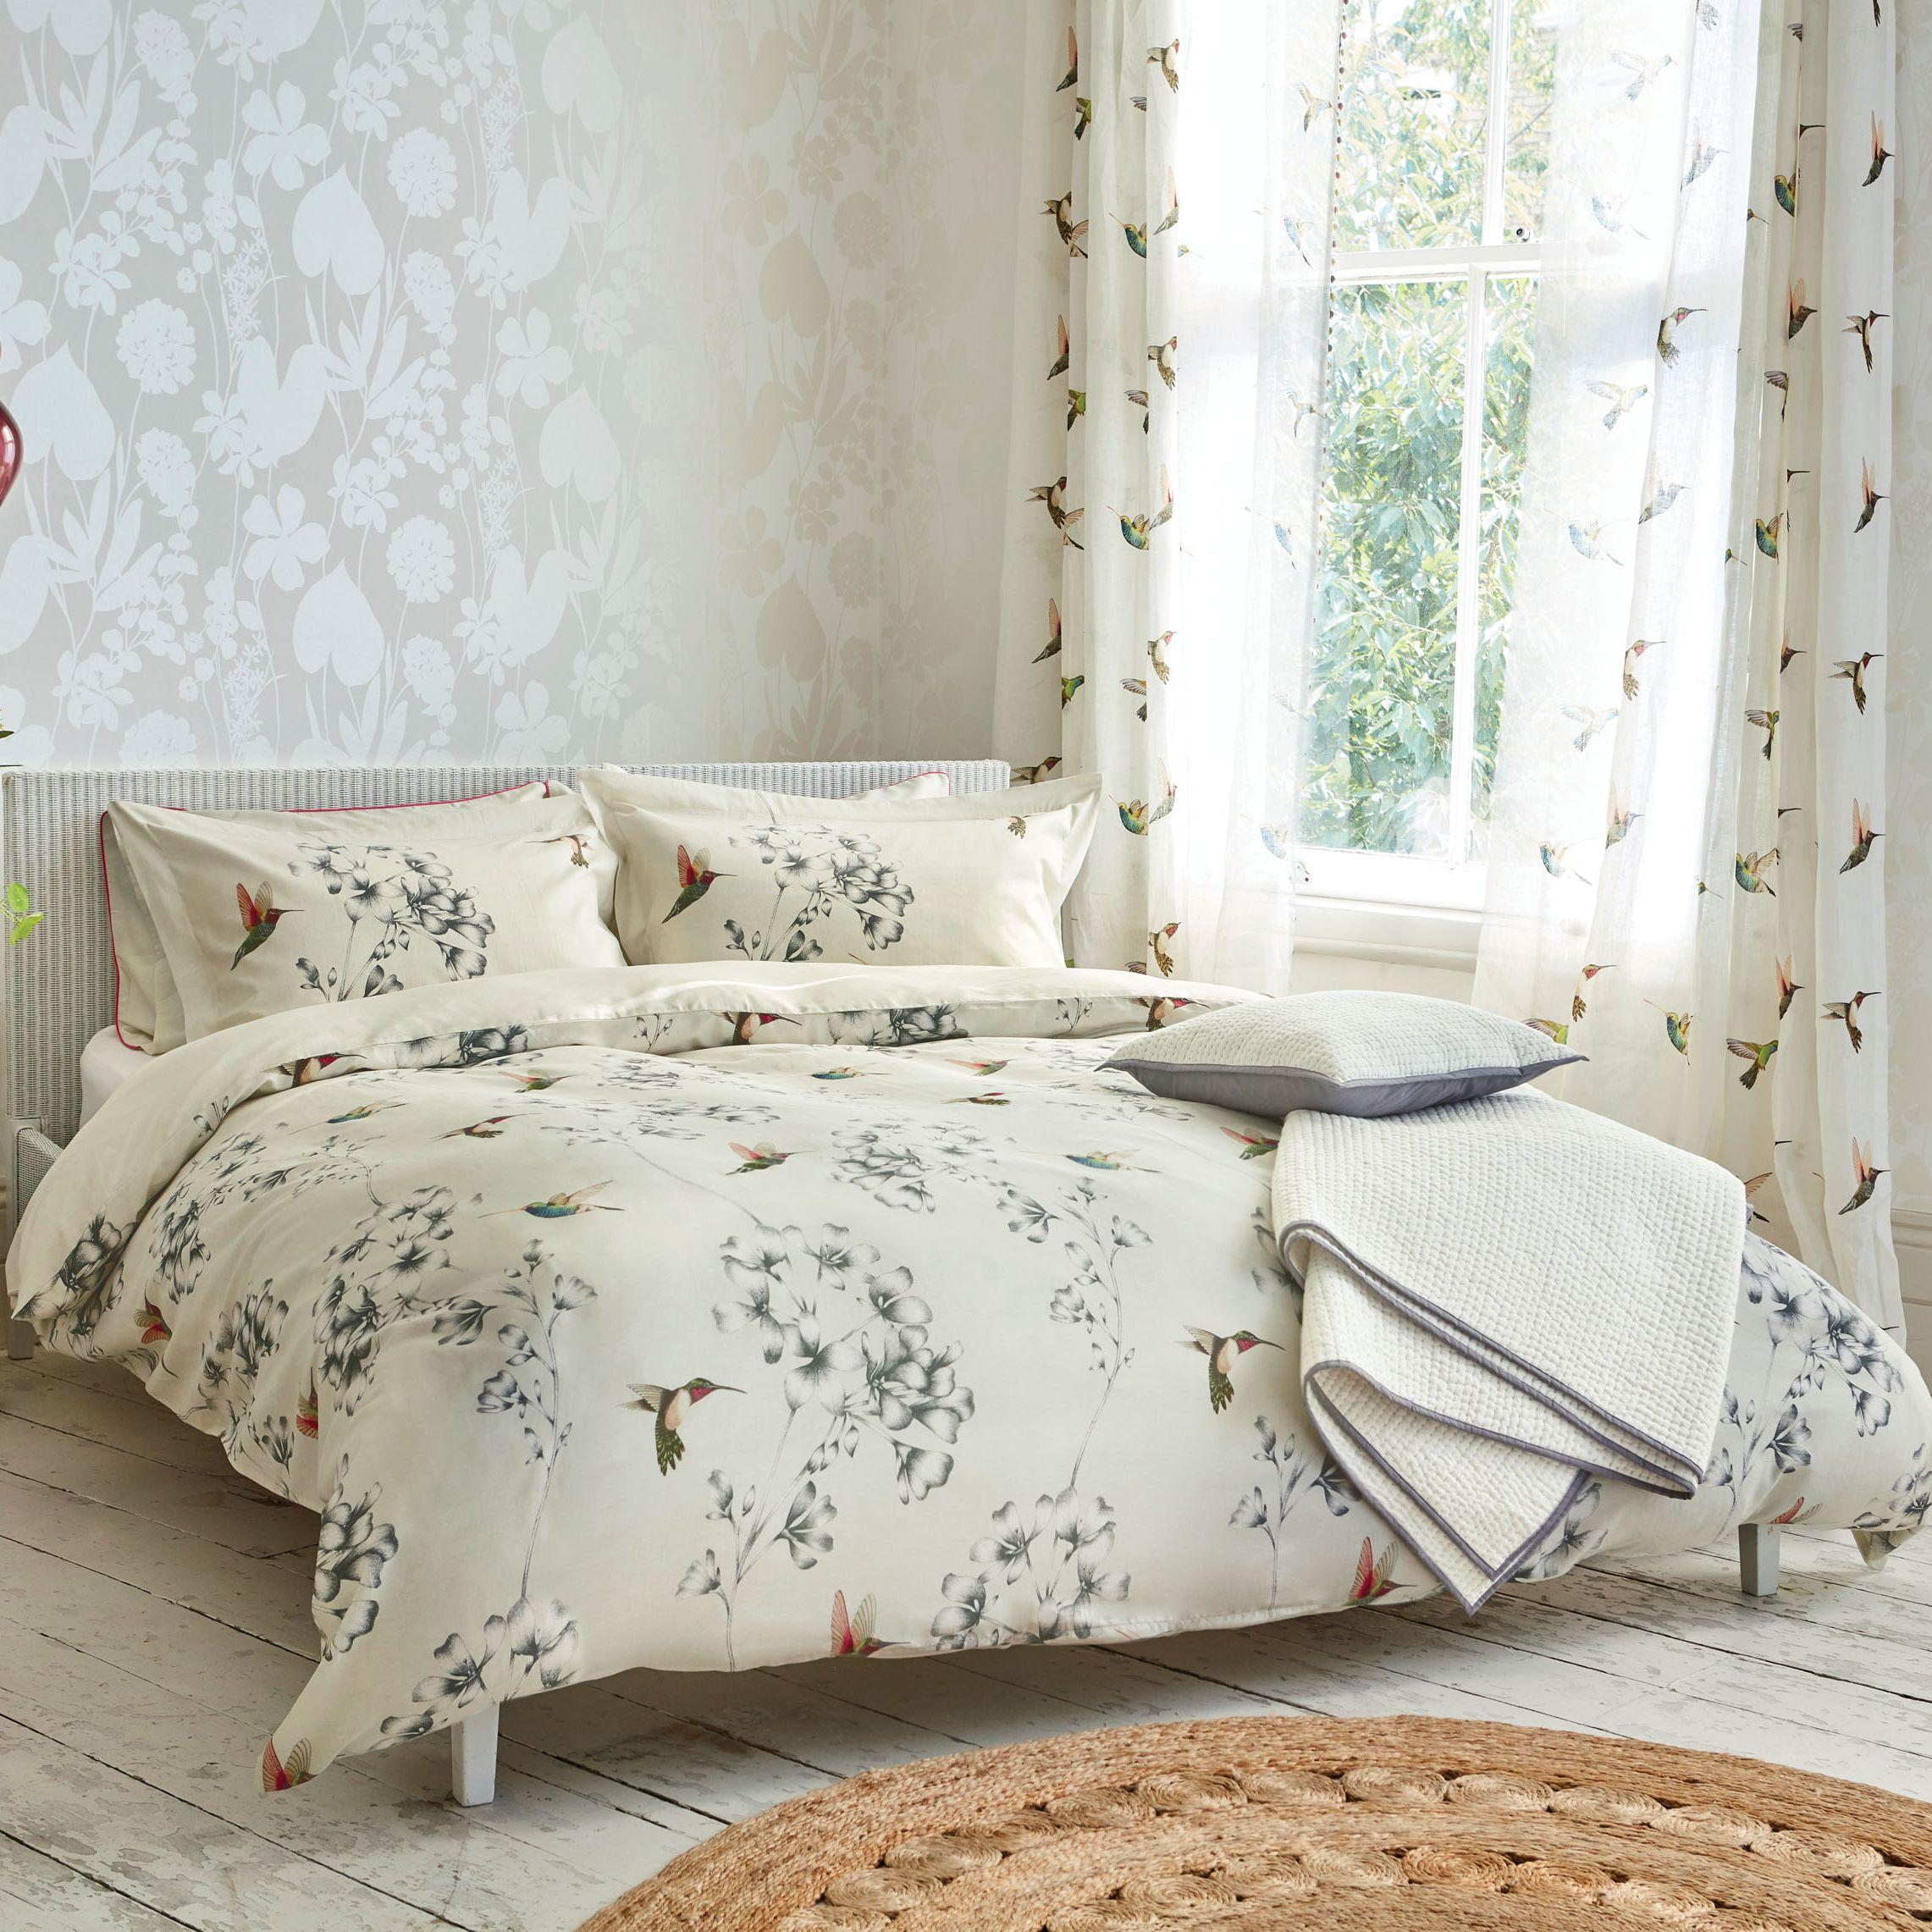 Harlequin Harlequin Amazilla Bedding